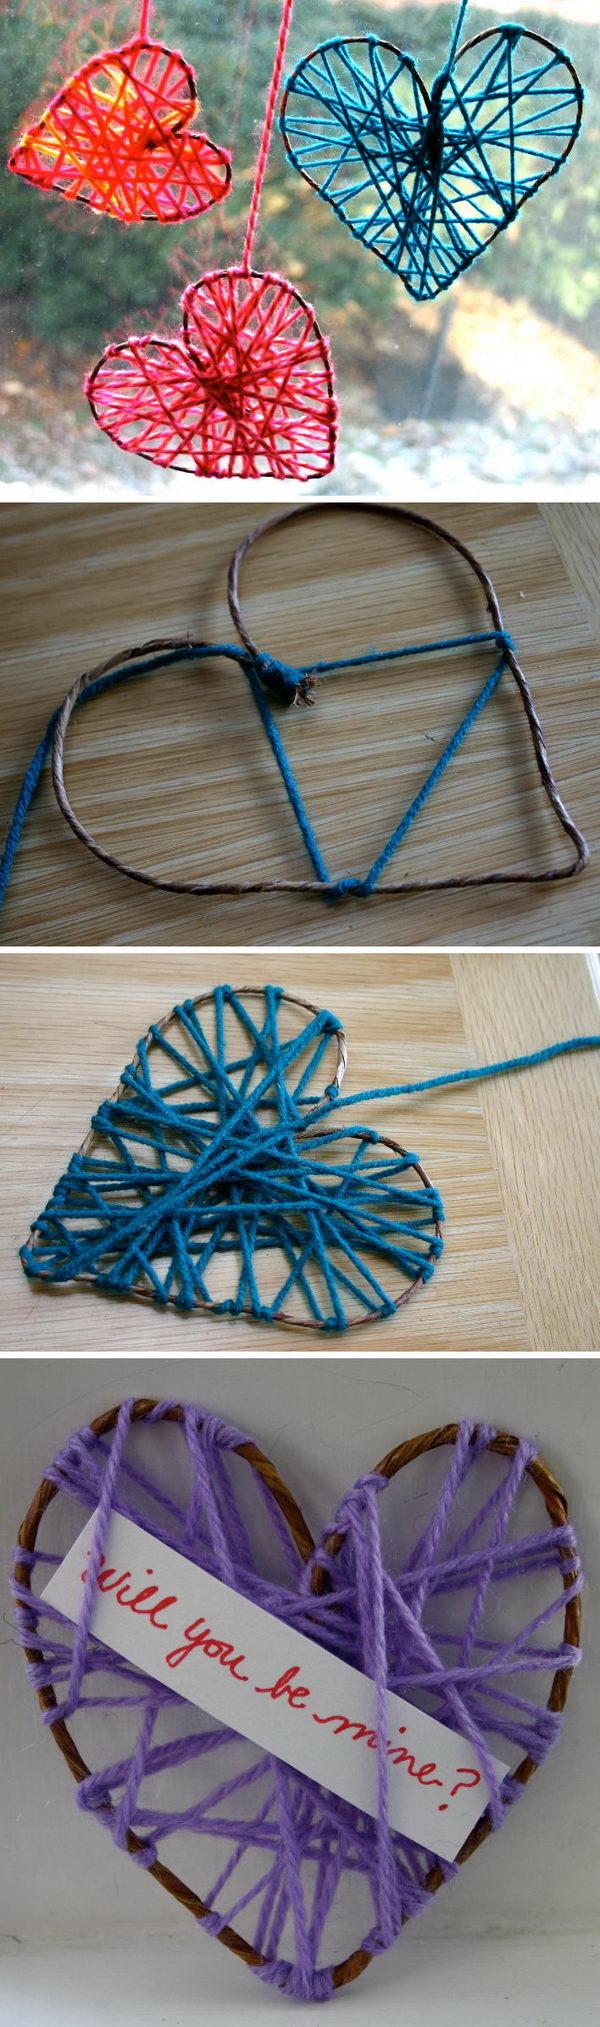 DIY Yarn Hearts.